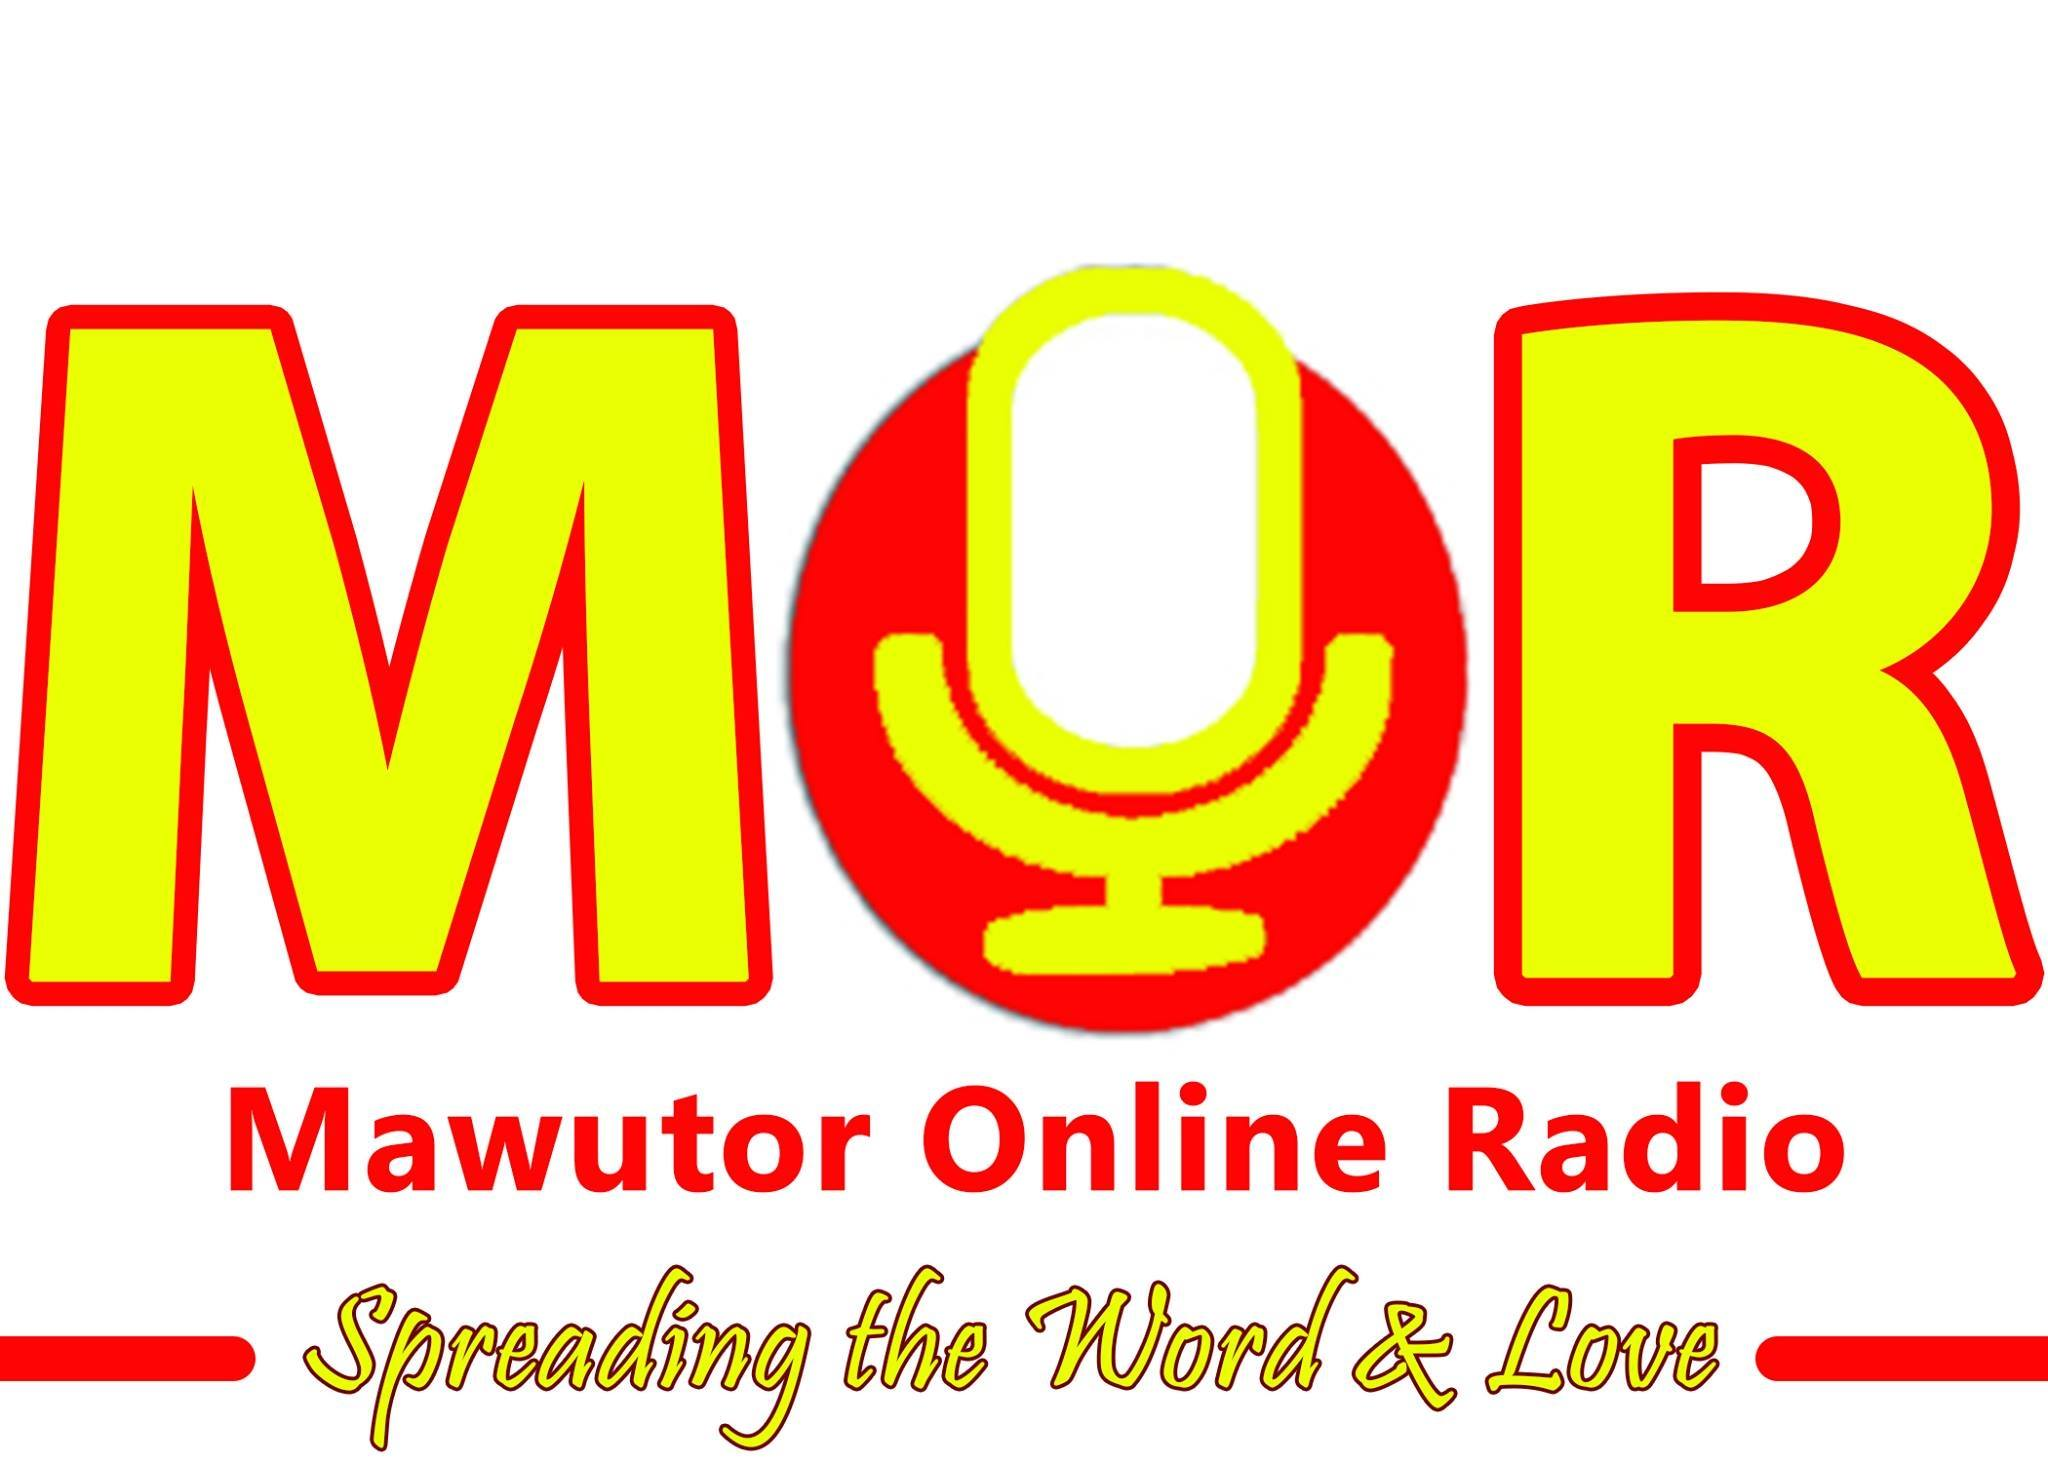 MAWUTOR ONLINE RADIO